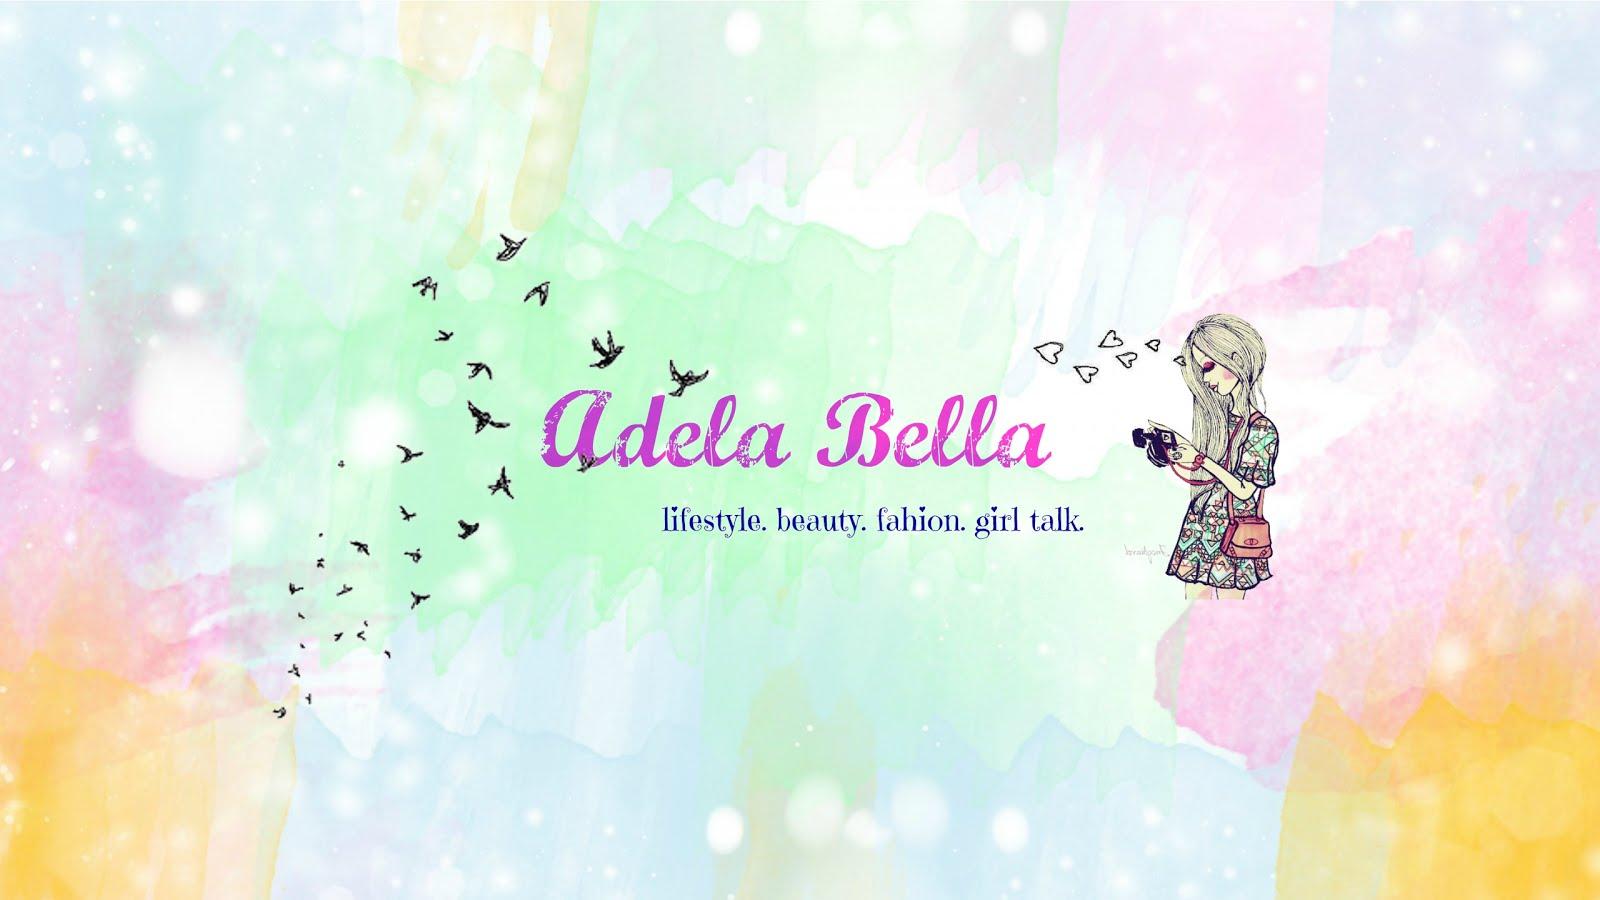 Adela Bella